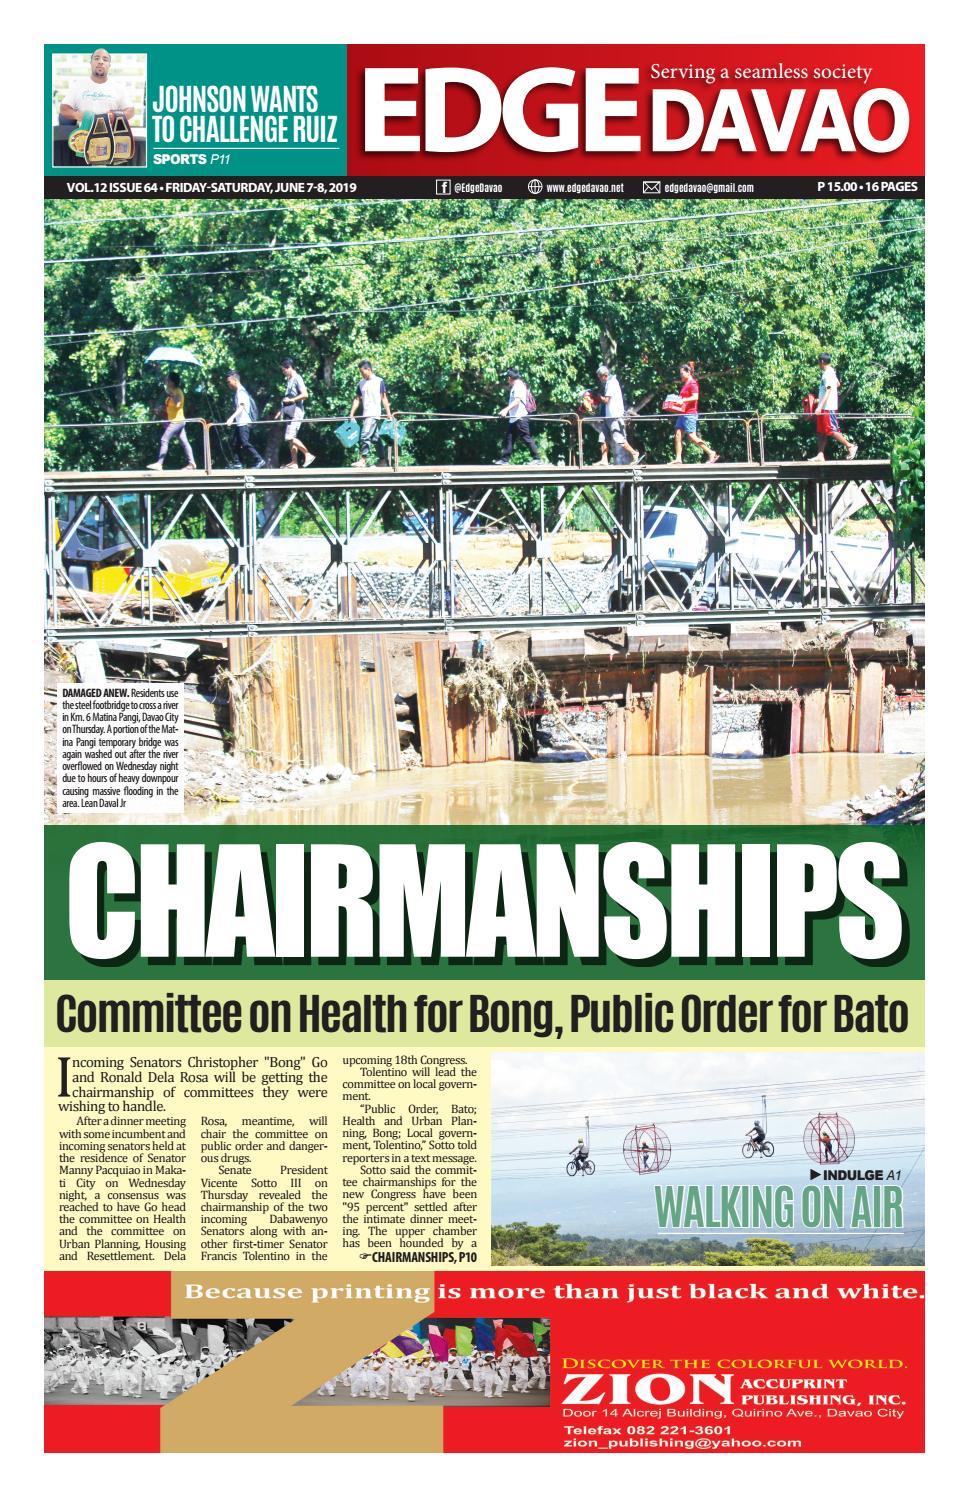 Edge Davao Volume 12 Issue 64   Friday-Saturday, June 7-8